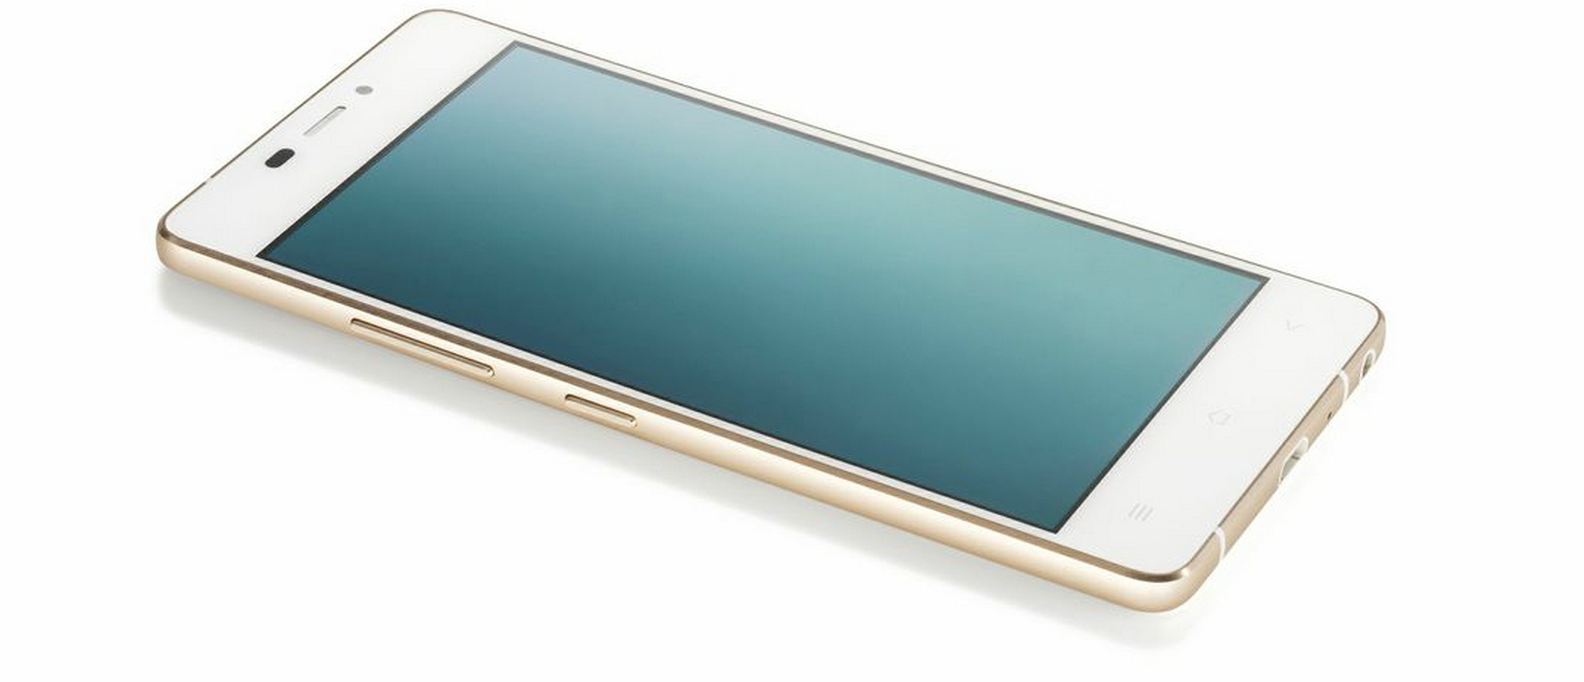 Kazam Tornado 348 World's Thnnest Smartphone